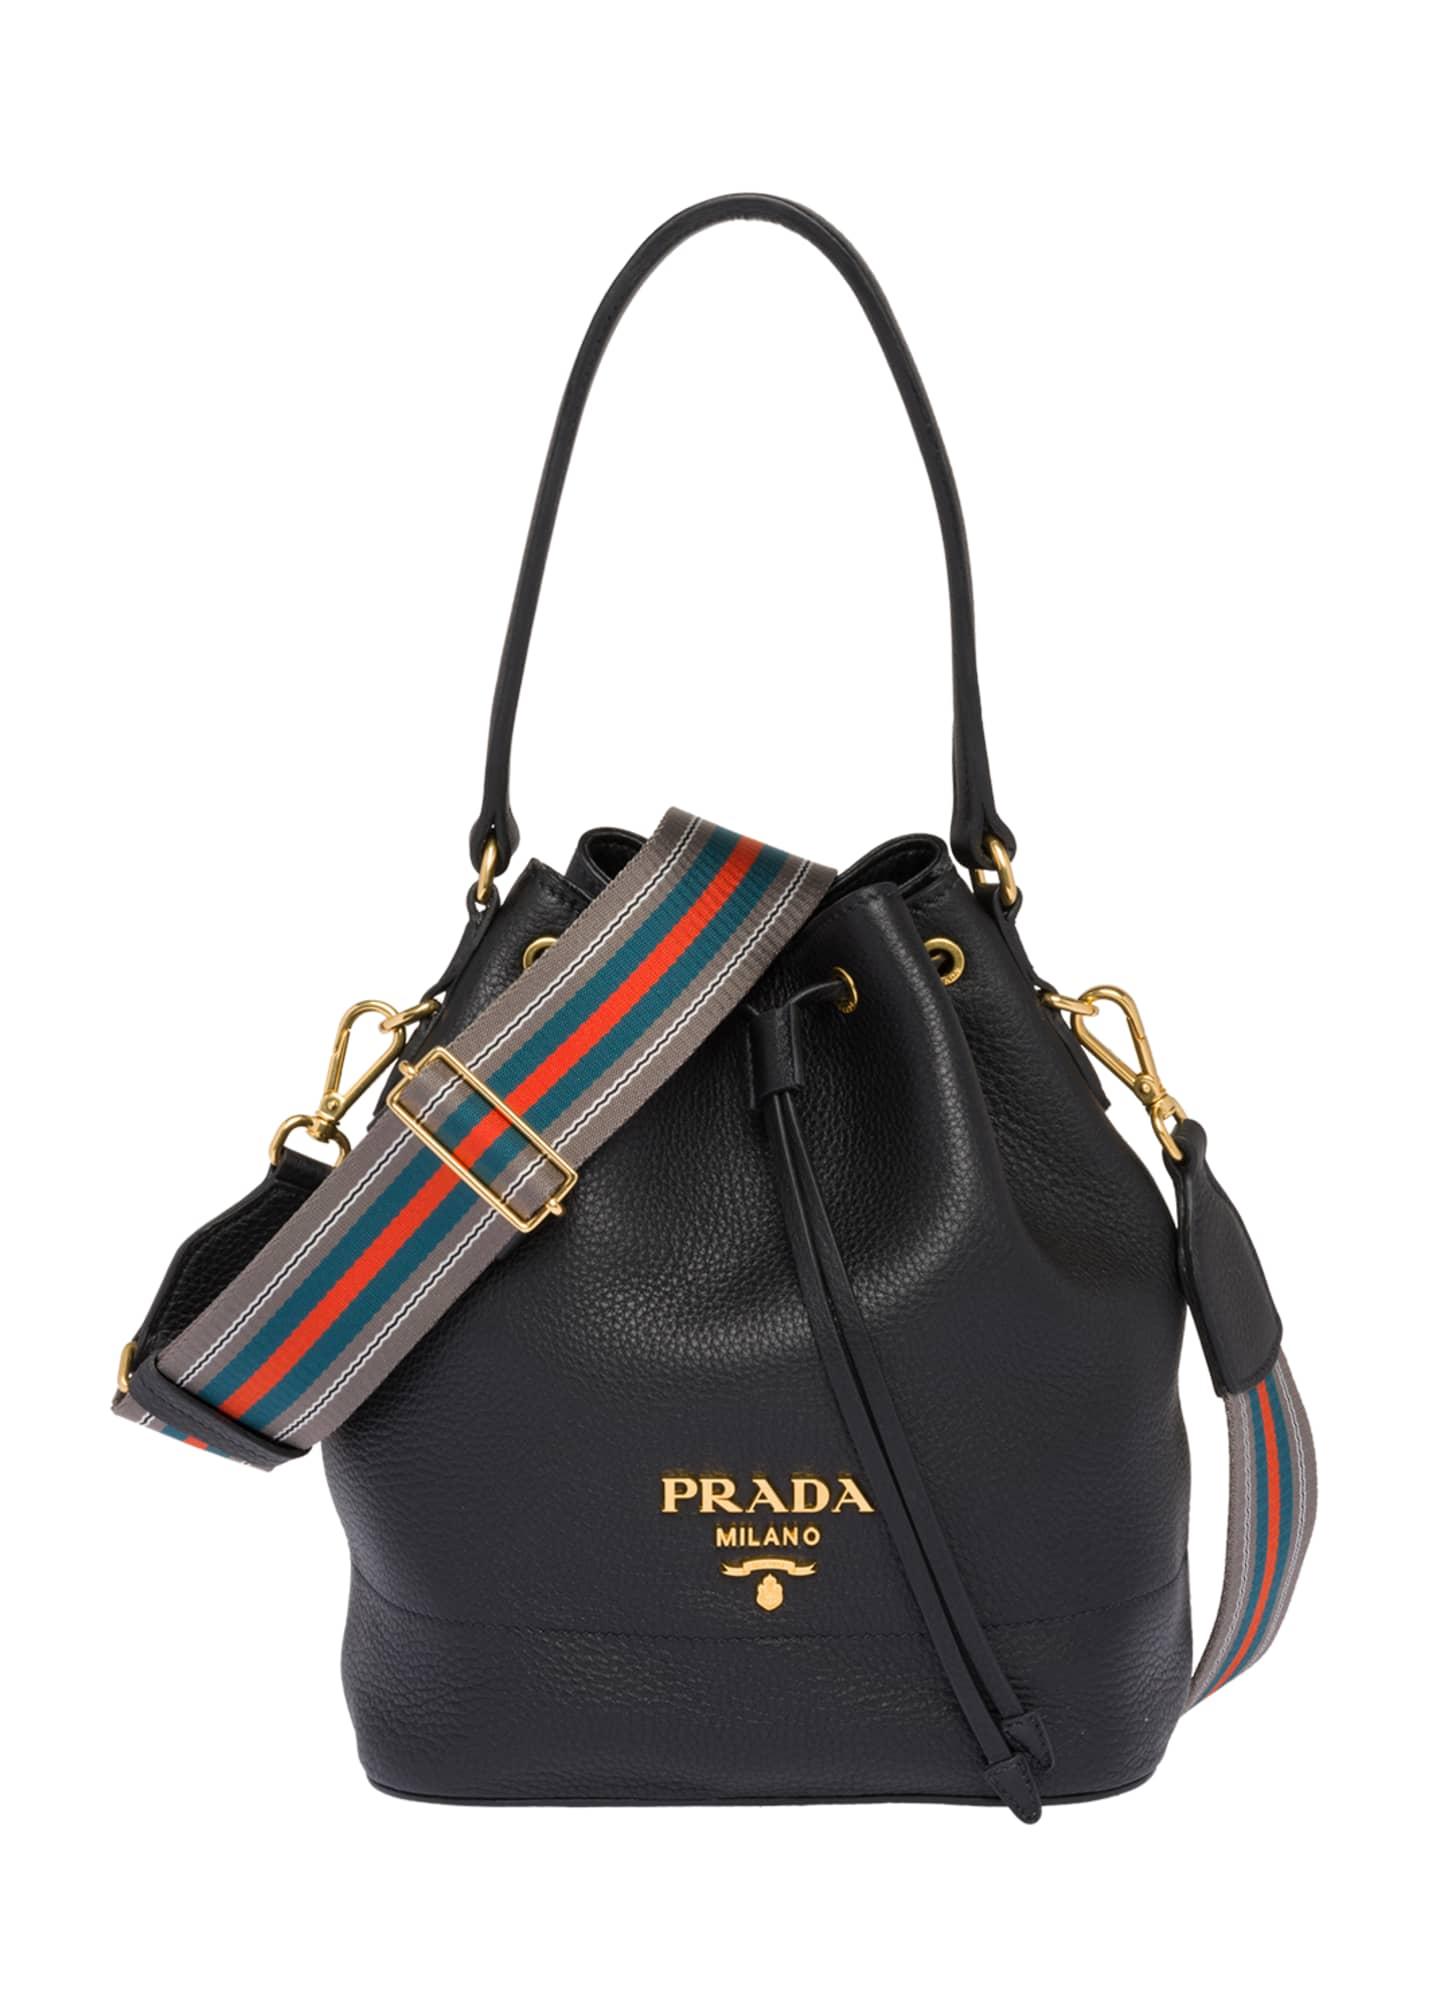 Prada Daino Top-Handle Bucket Bag with Web Strap